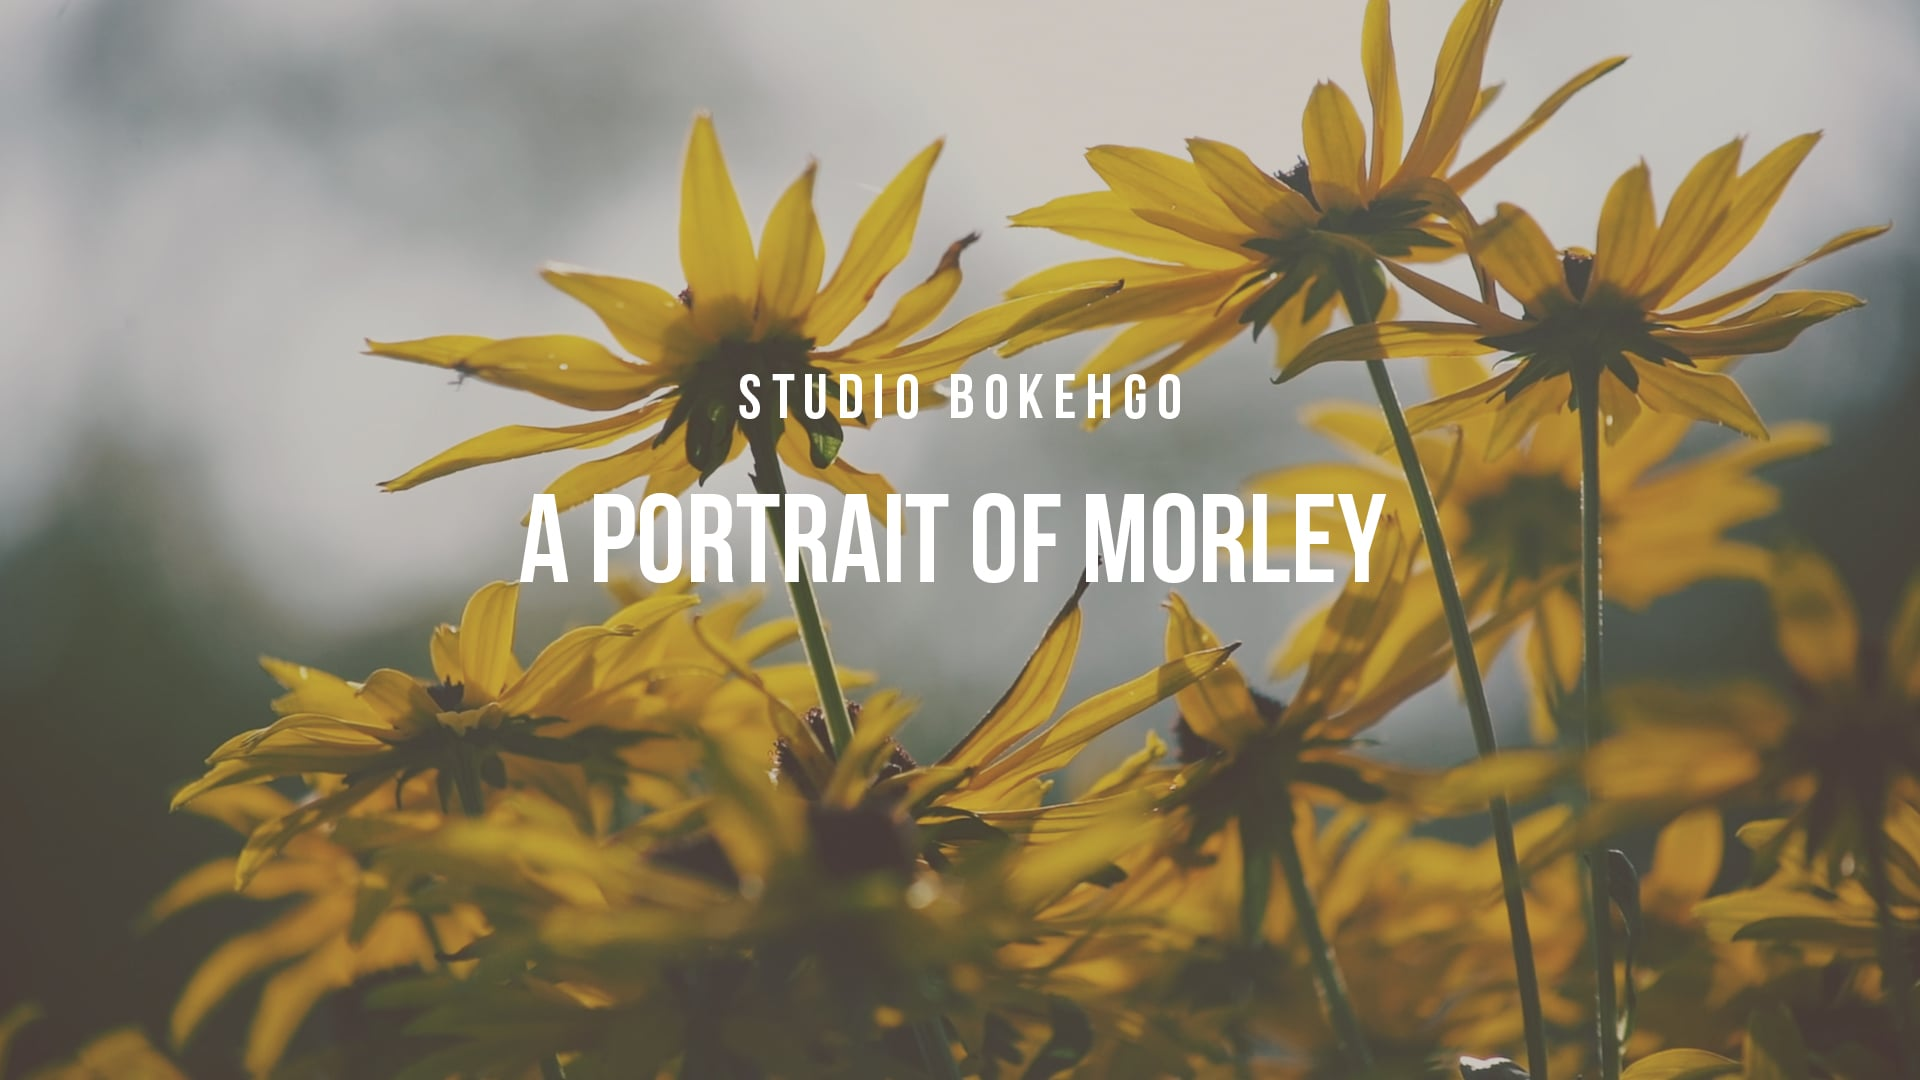 The Morley Arts Festival Film 2020 - Studio Bokehgo